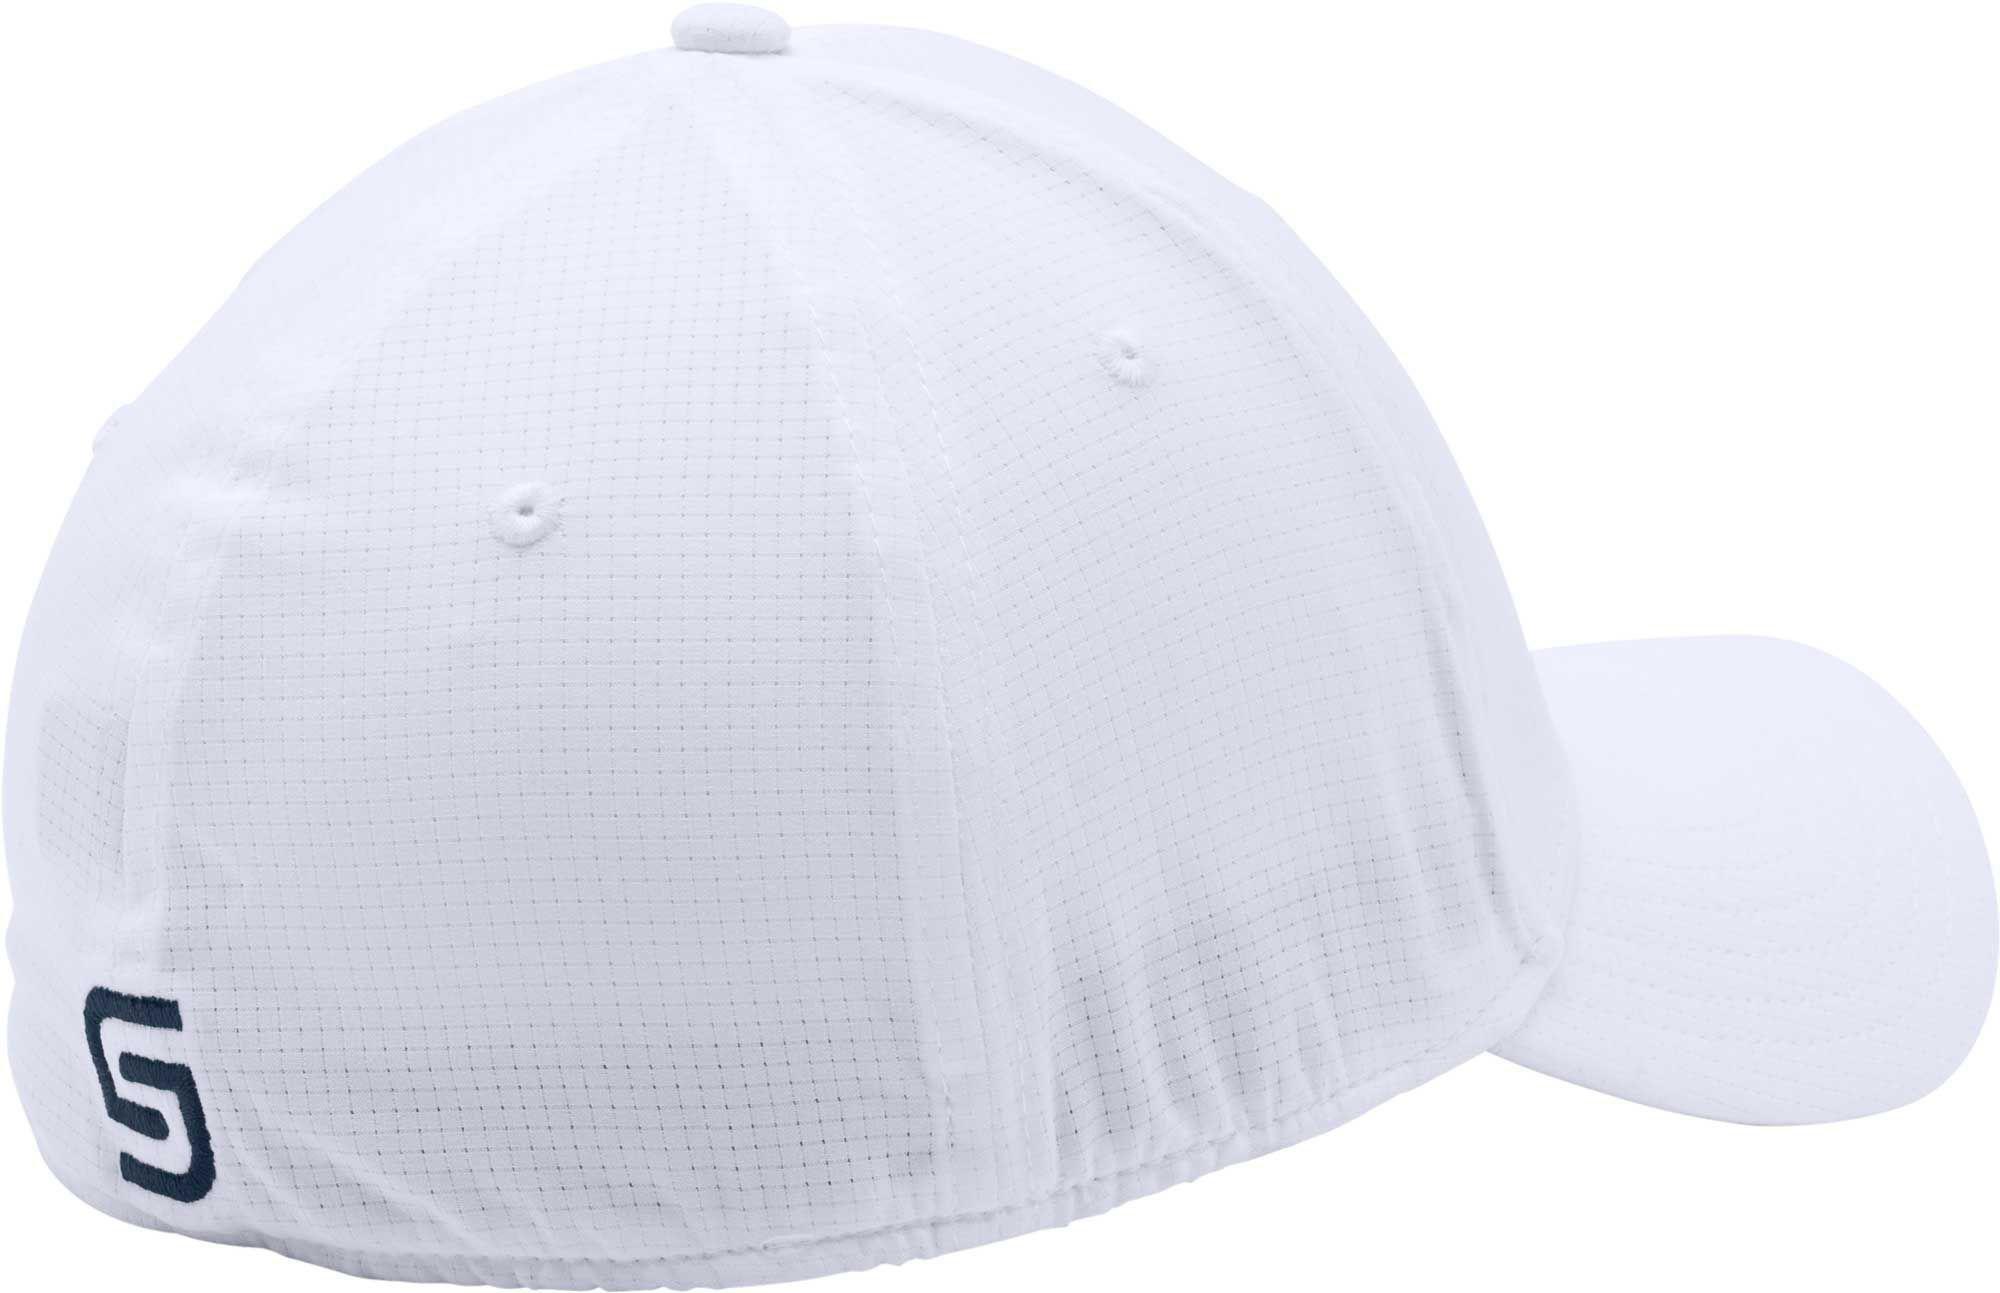 c7d3f0b23a01 Lyst - Under Armour Jordan Spieth Official Tour 2.0 Golf Hat in ...